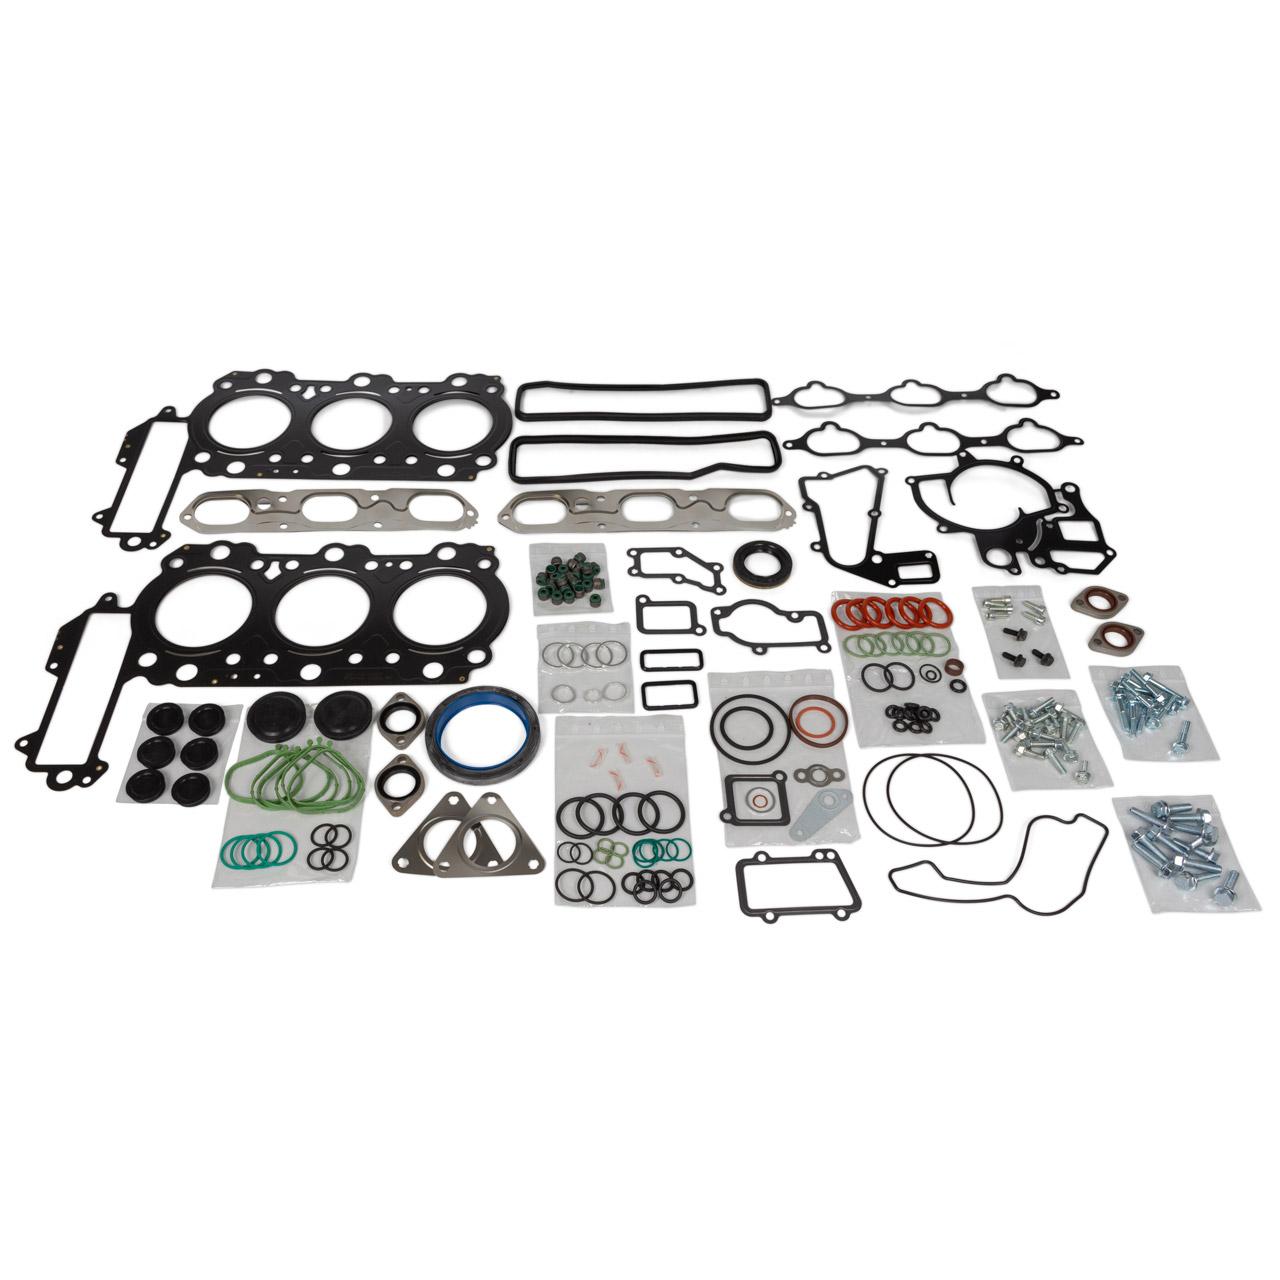 Motordichtungssatz PORSCHE Boxster 986 S 3.2 260/266 PS M96.24